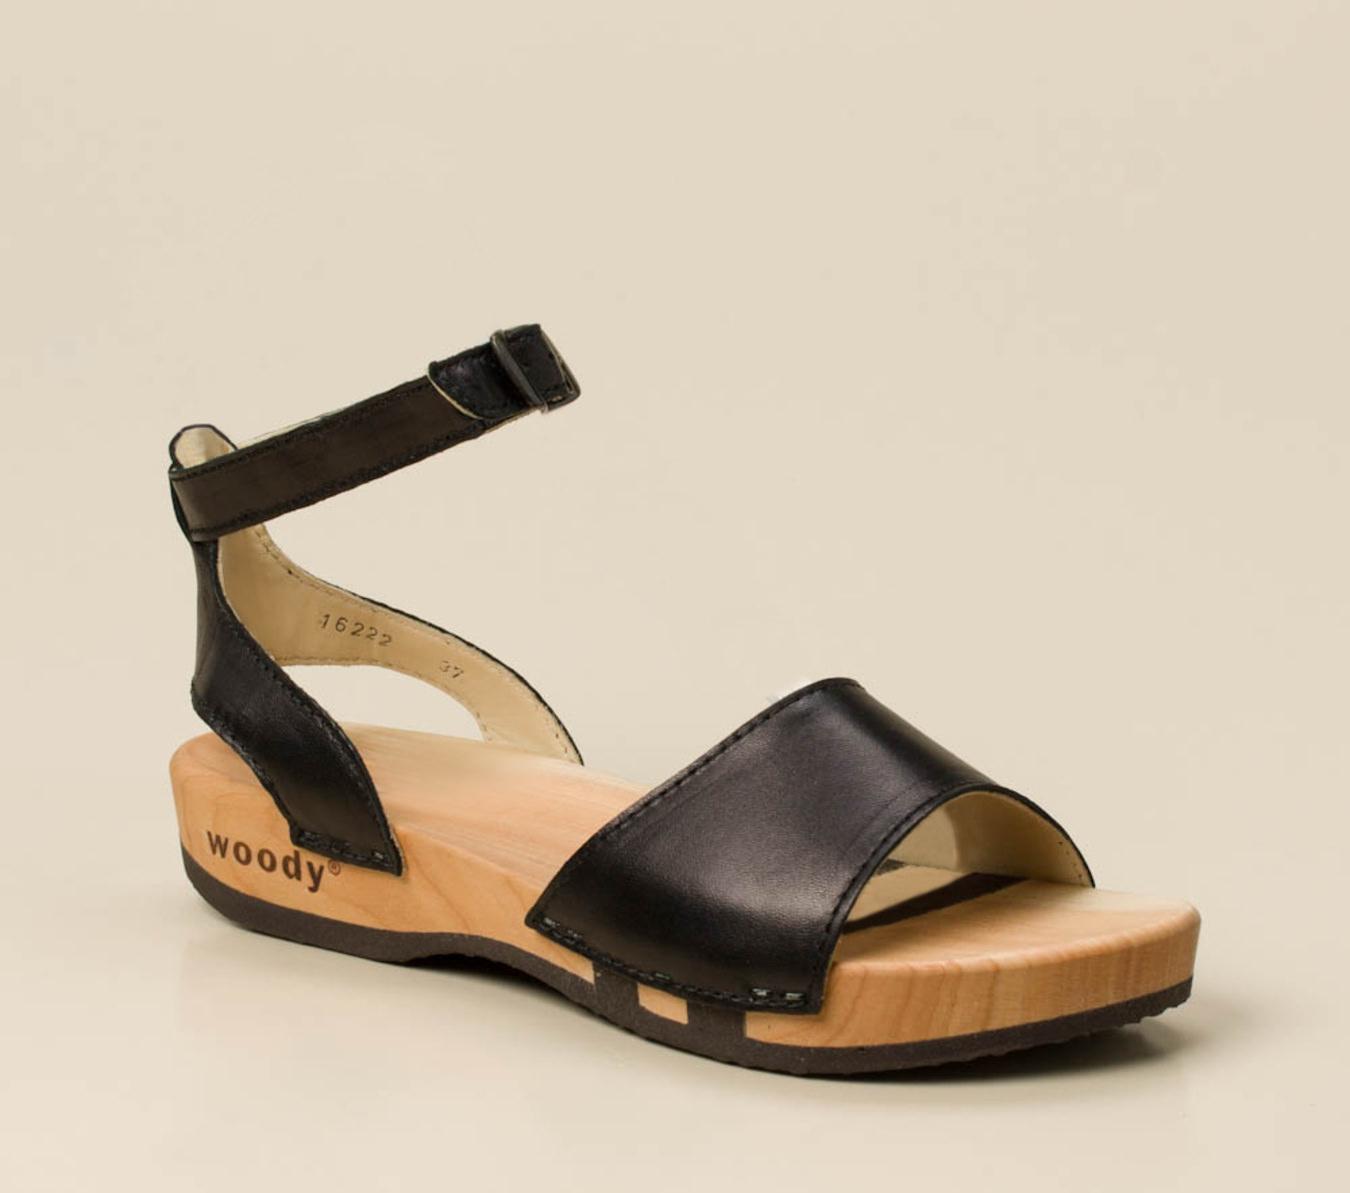 Goede Woody Damen Sandale in schwarz kaufen | Zumnorde Online-Shop OS-52